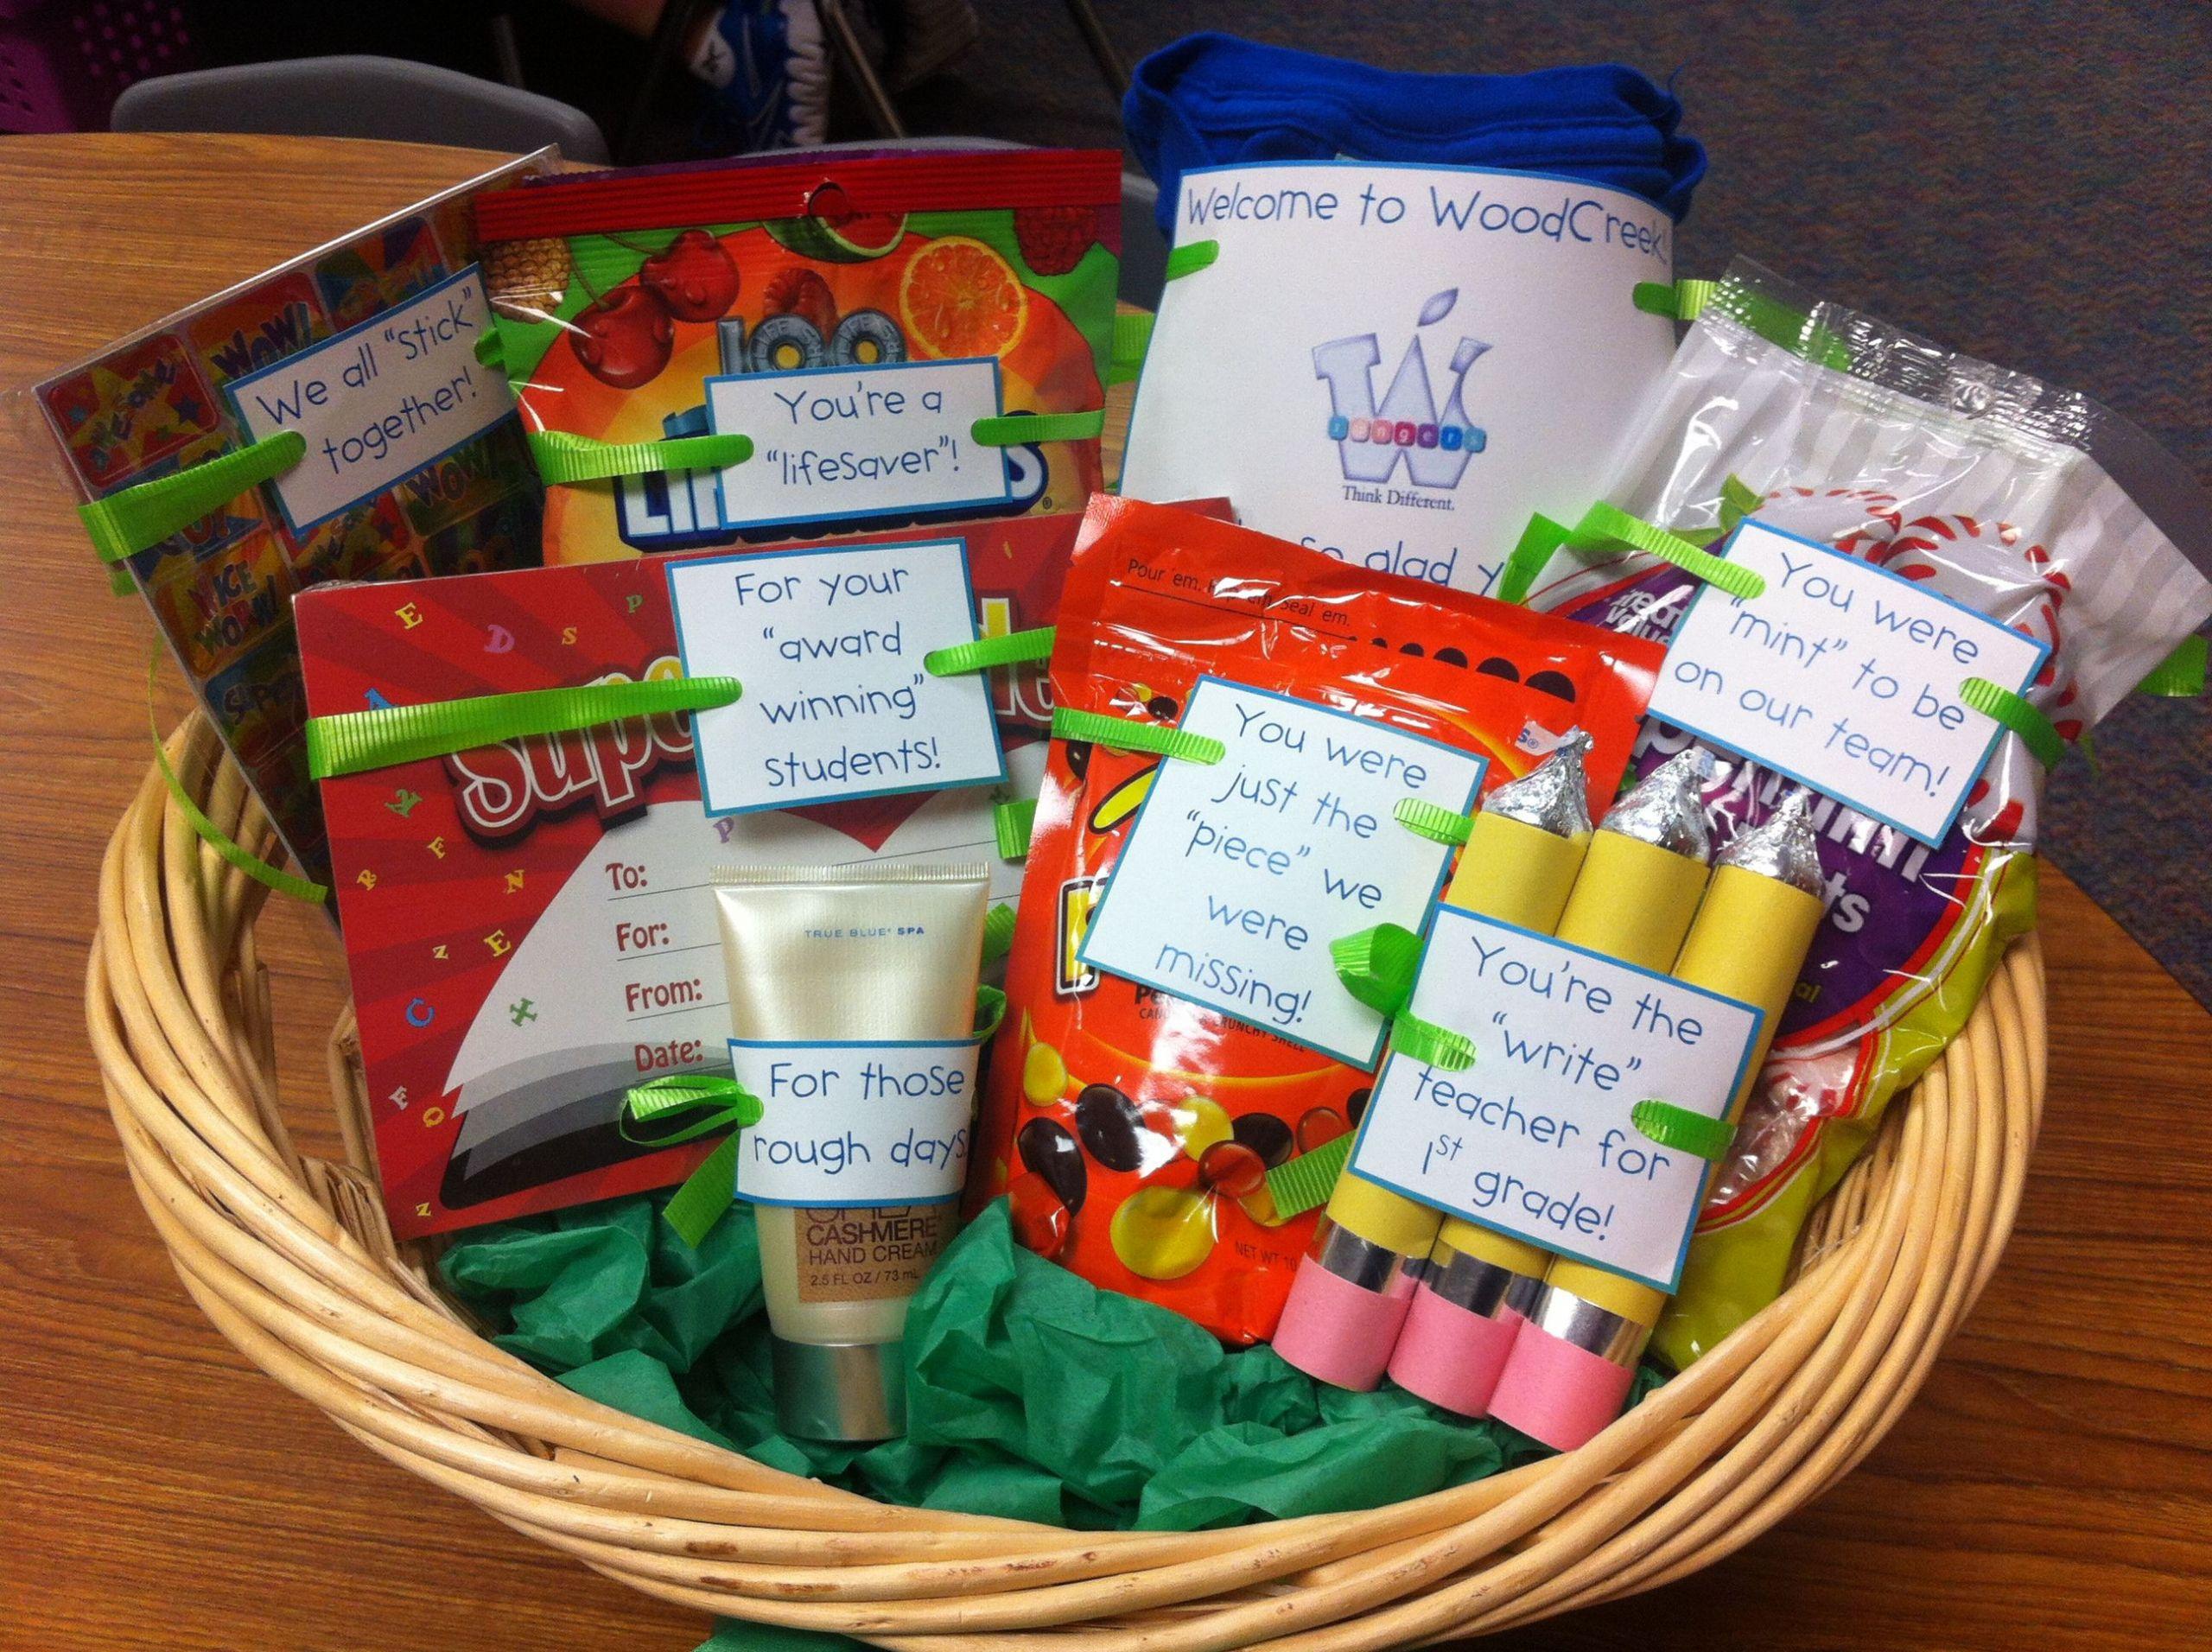 New Teacher Gift Basket Ideas  Wel e to the team teacher t To cute what a GREAT